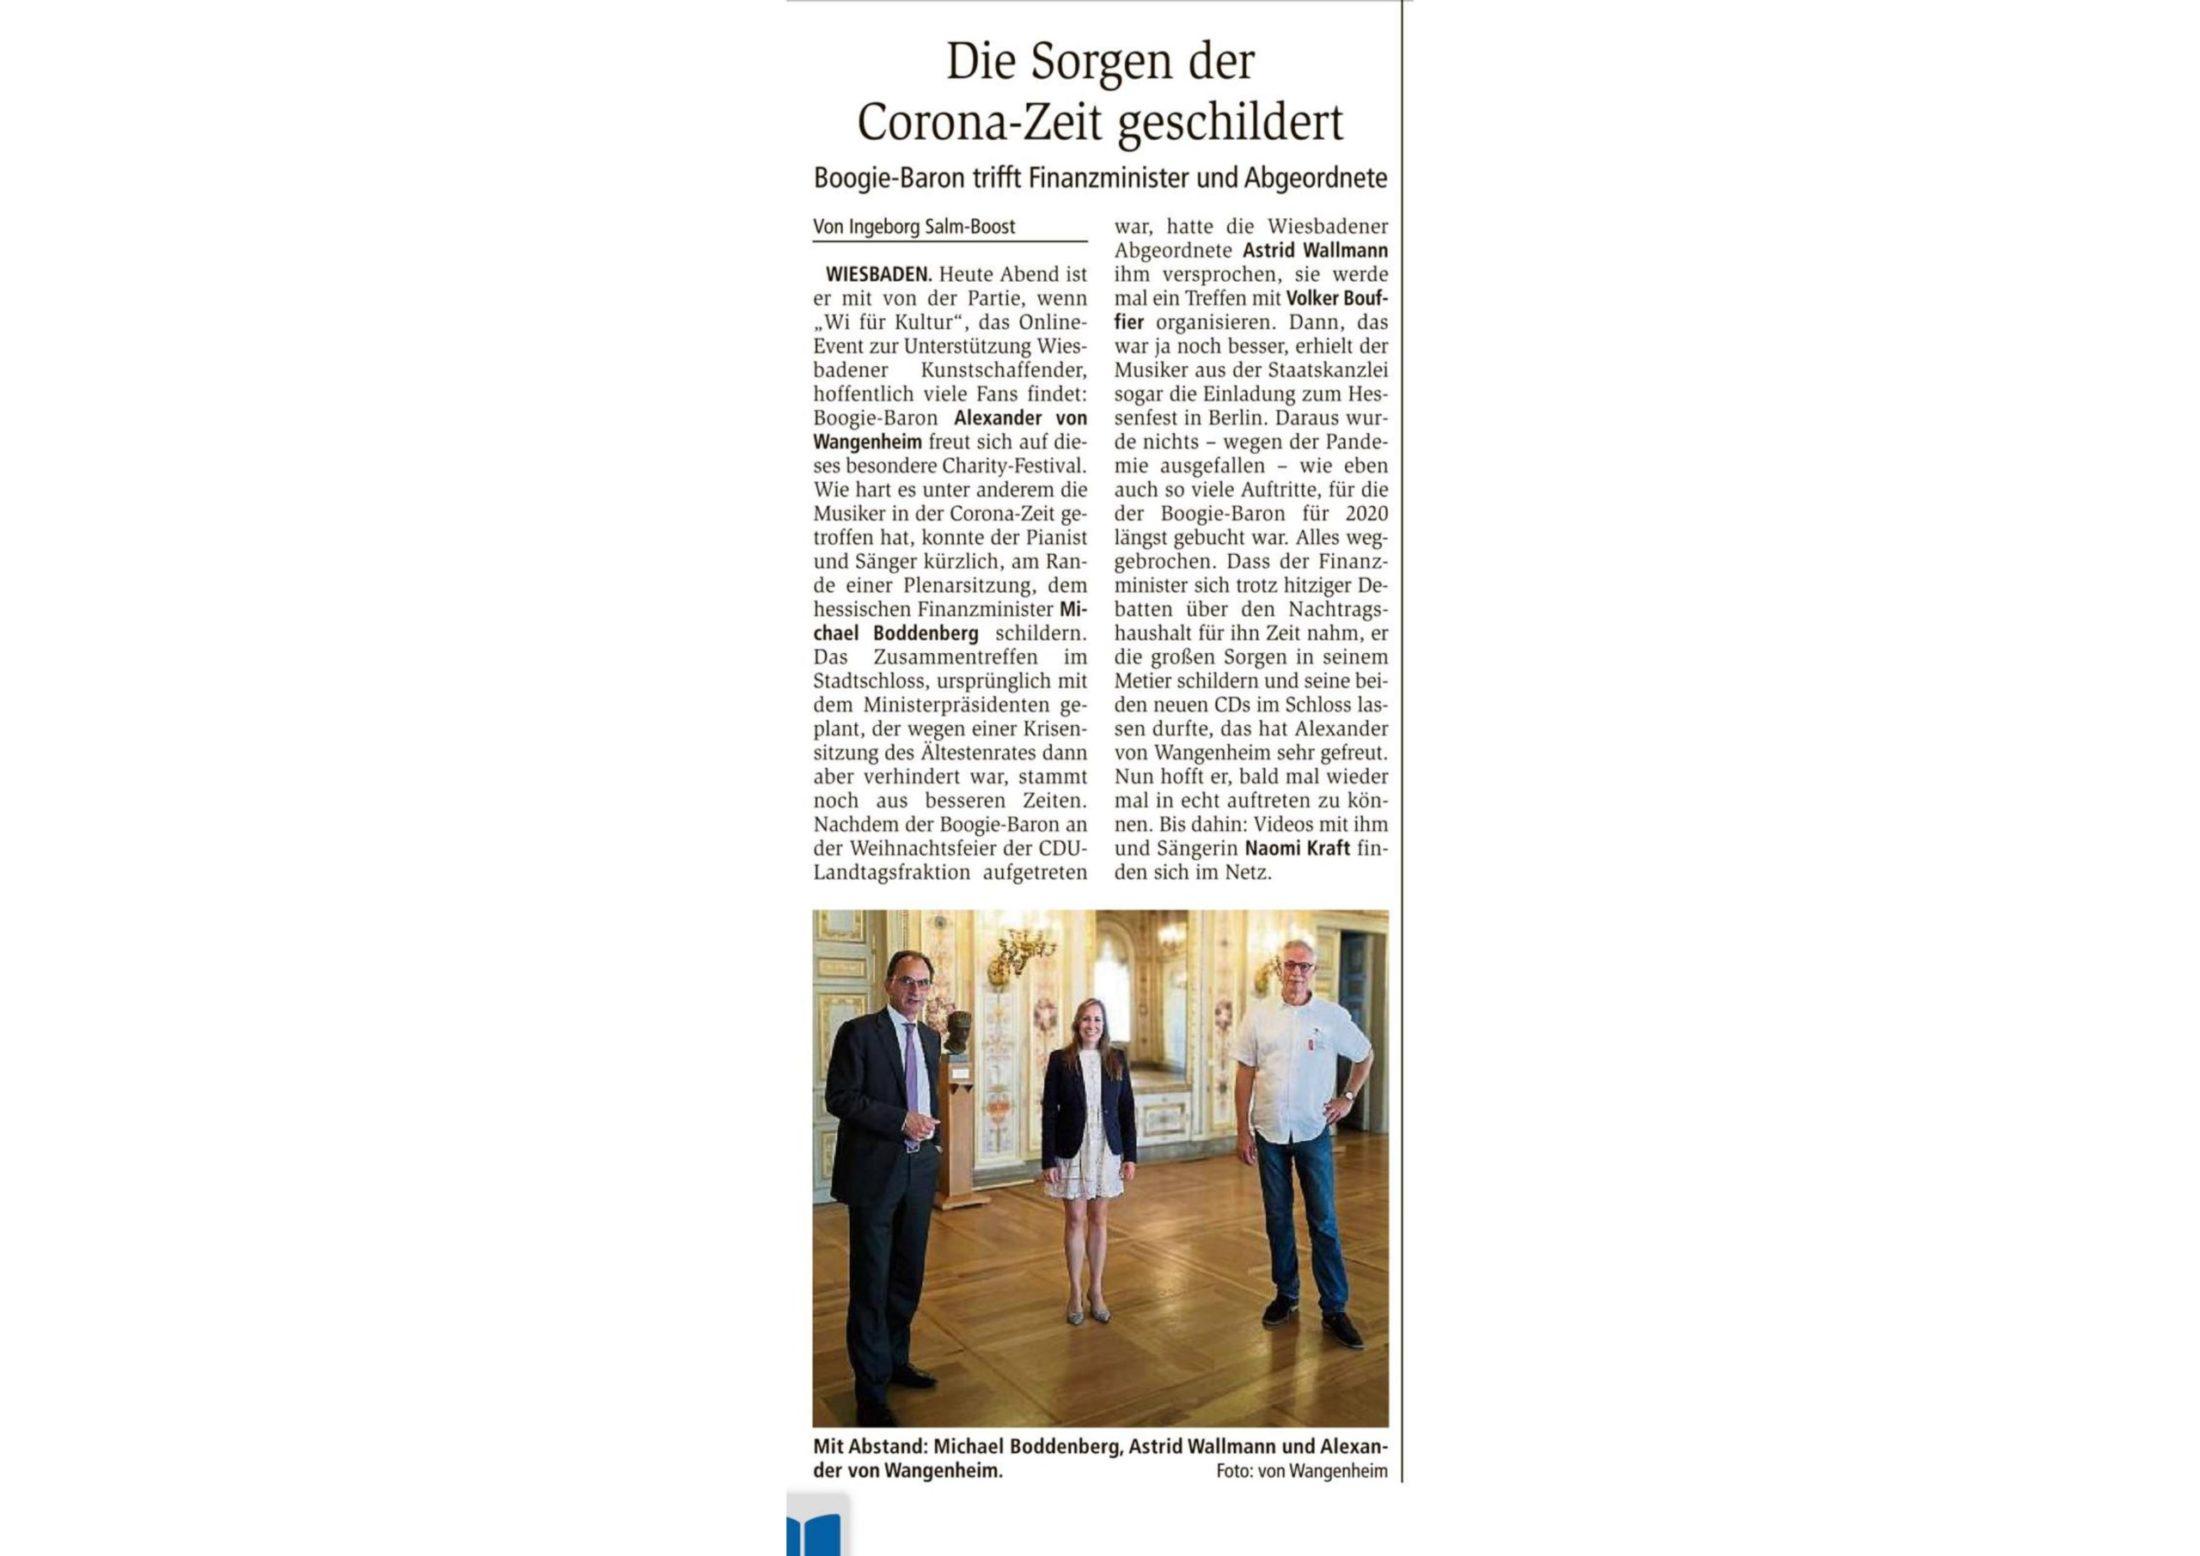 Astrid Wallmann, Michael Boddenberg, Alexander von Wangenheim